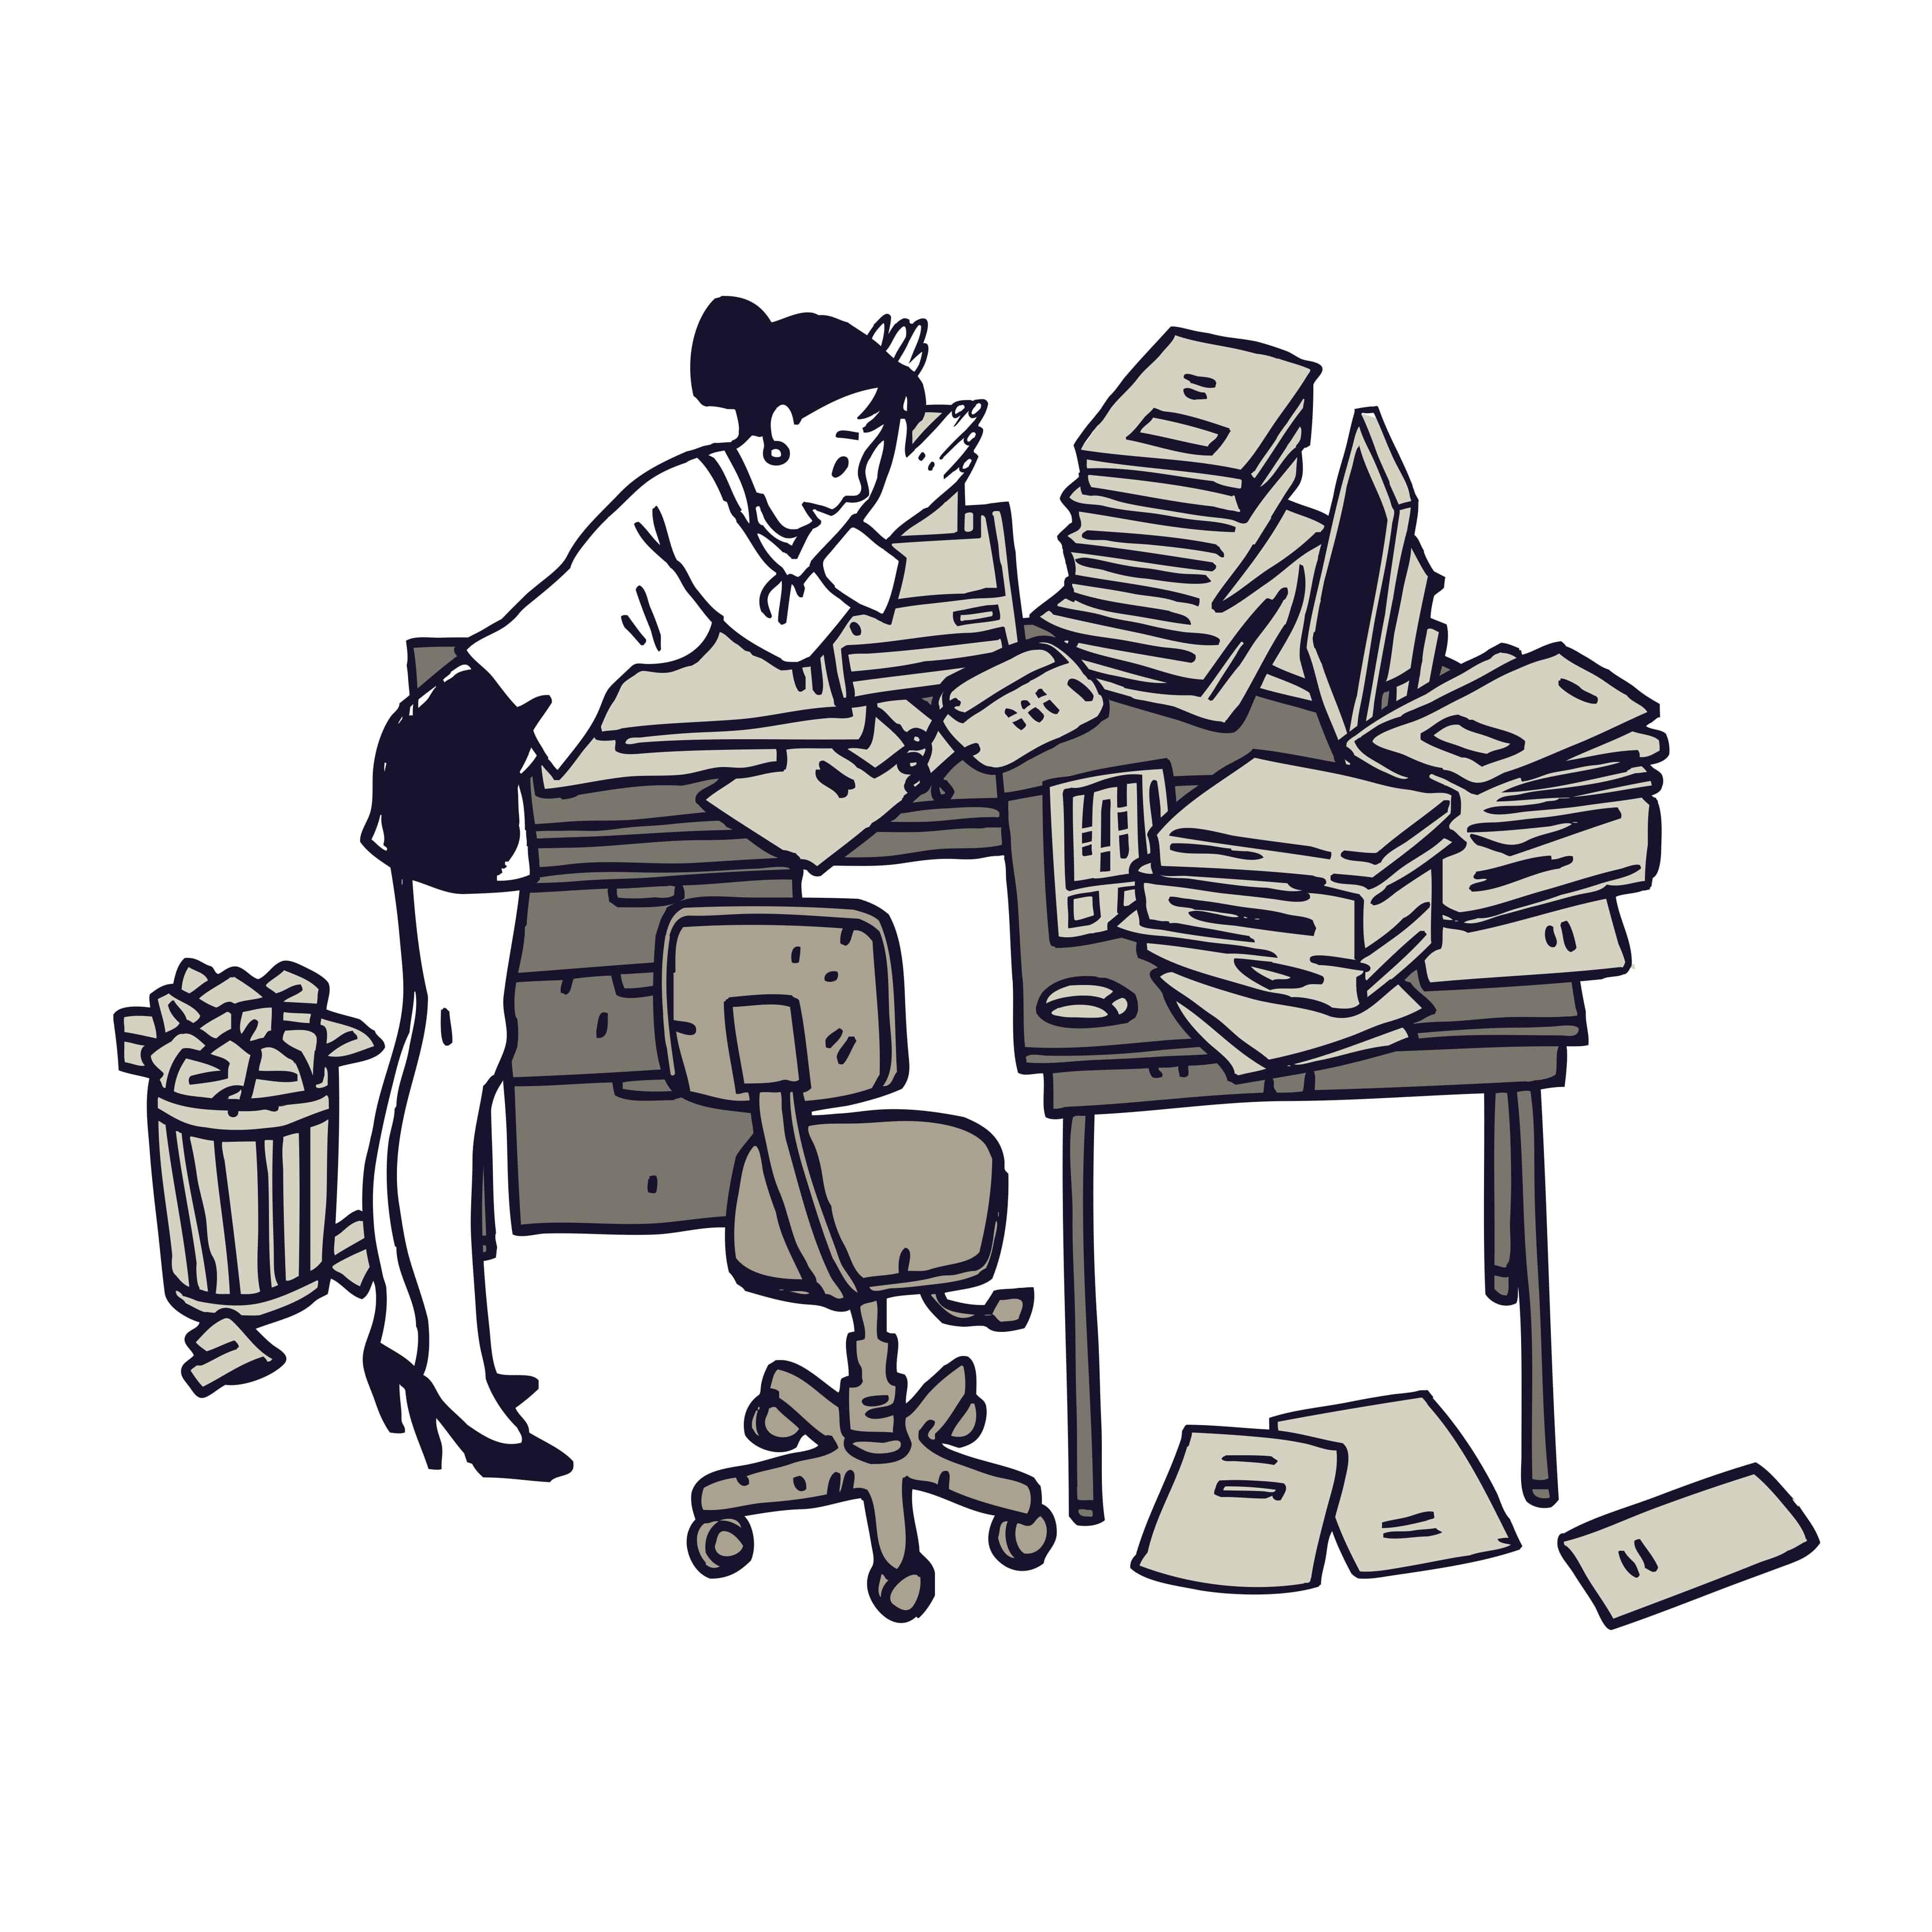 Картинка для бухгалтера на рабочий стол контур